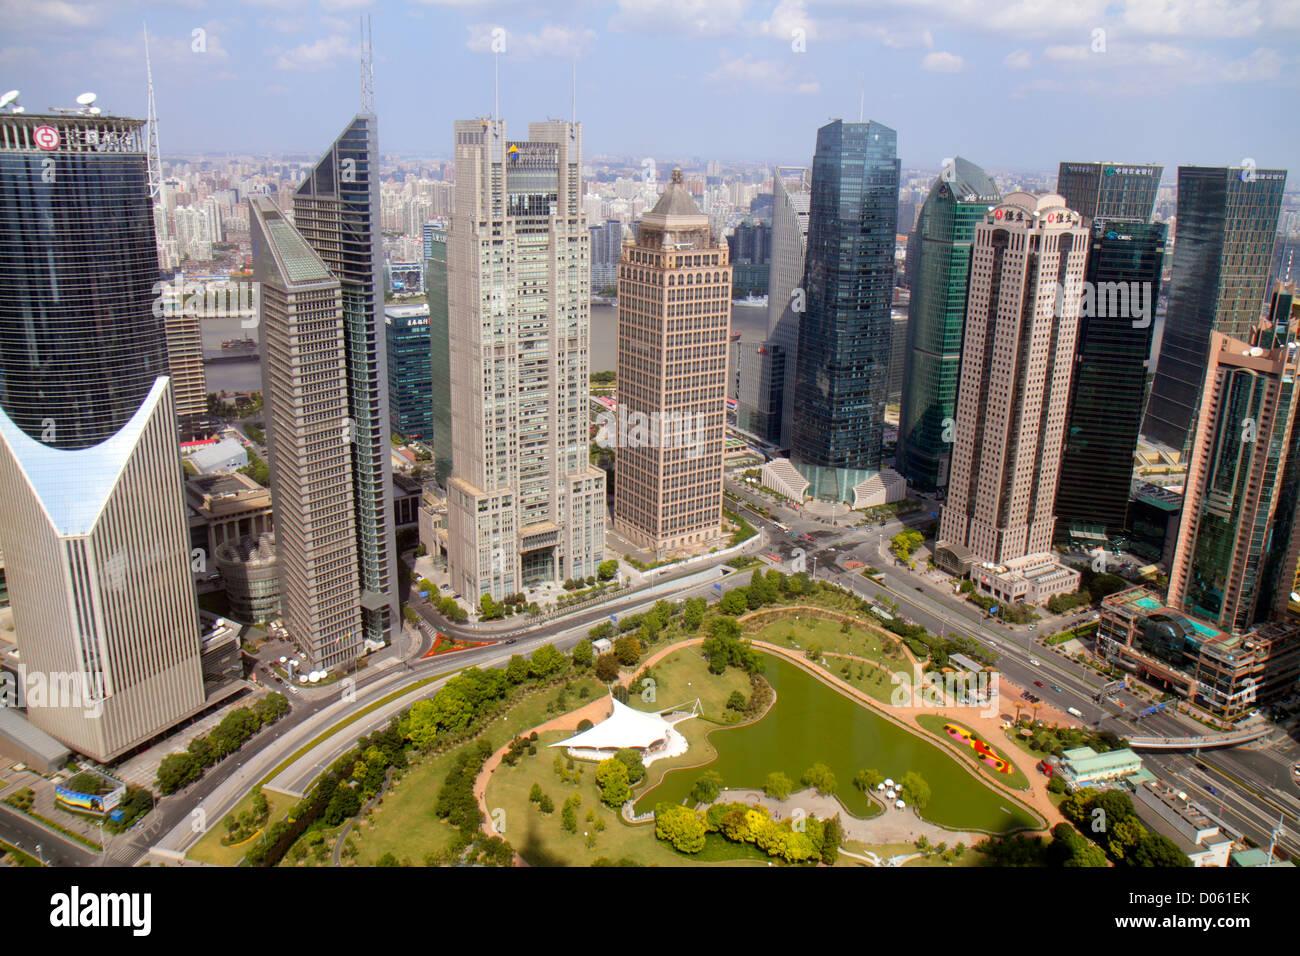 Shanghai Lujiazui: Finance and Trade Zone